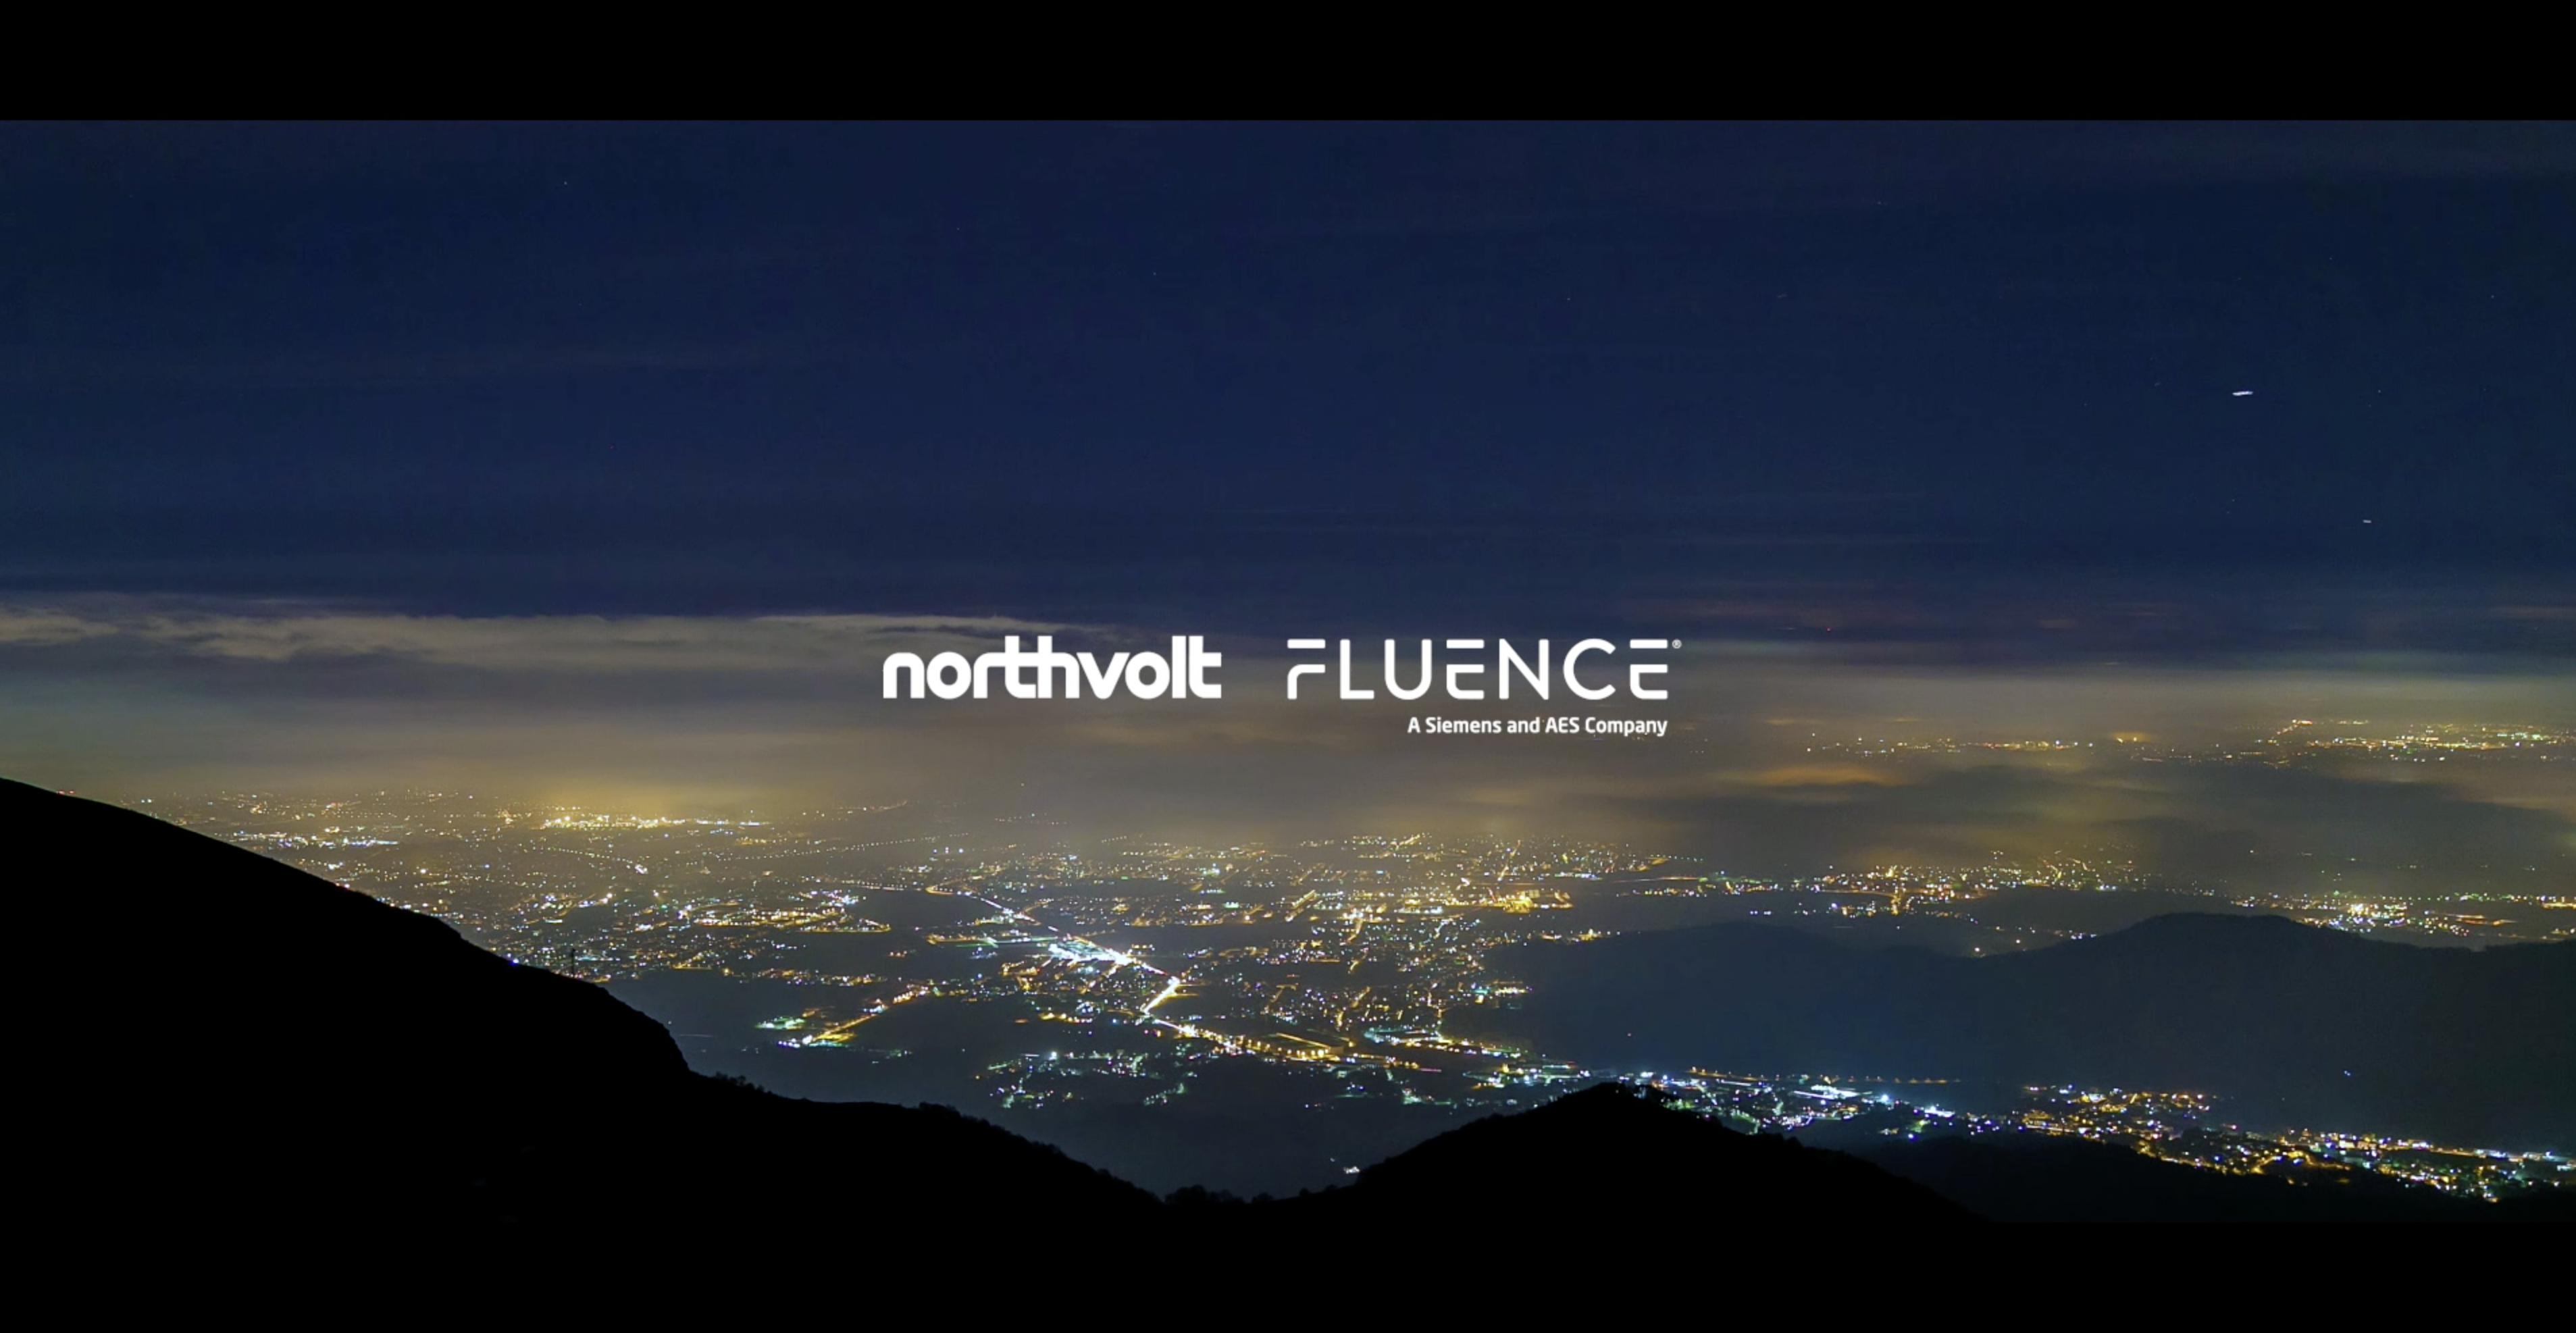 Fluence x Northvolt - Teaser (both logos)